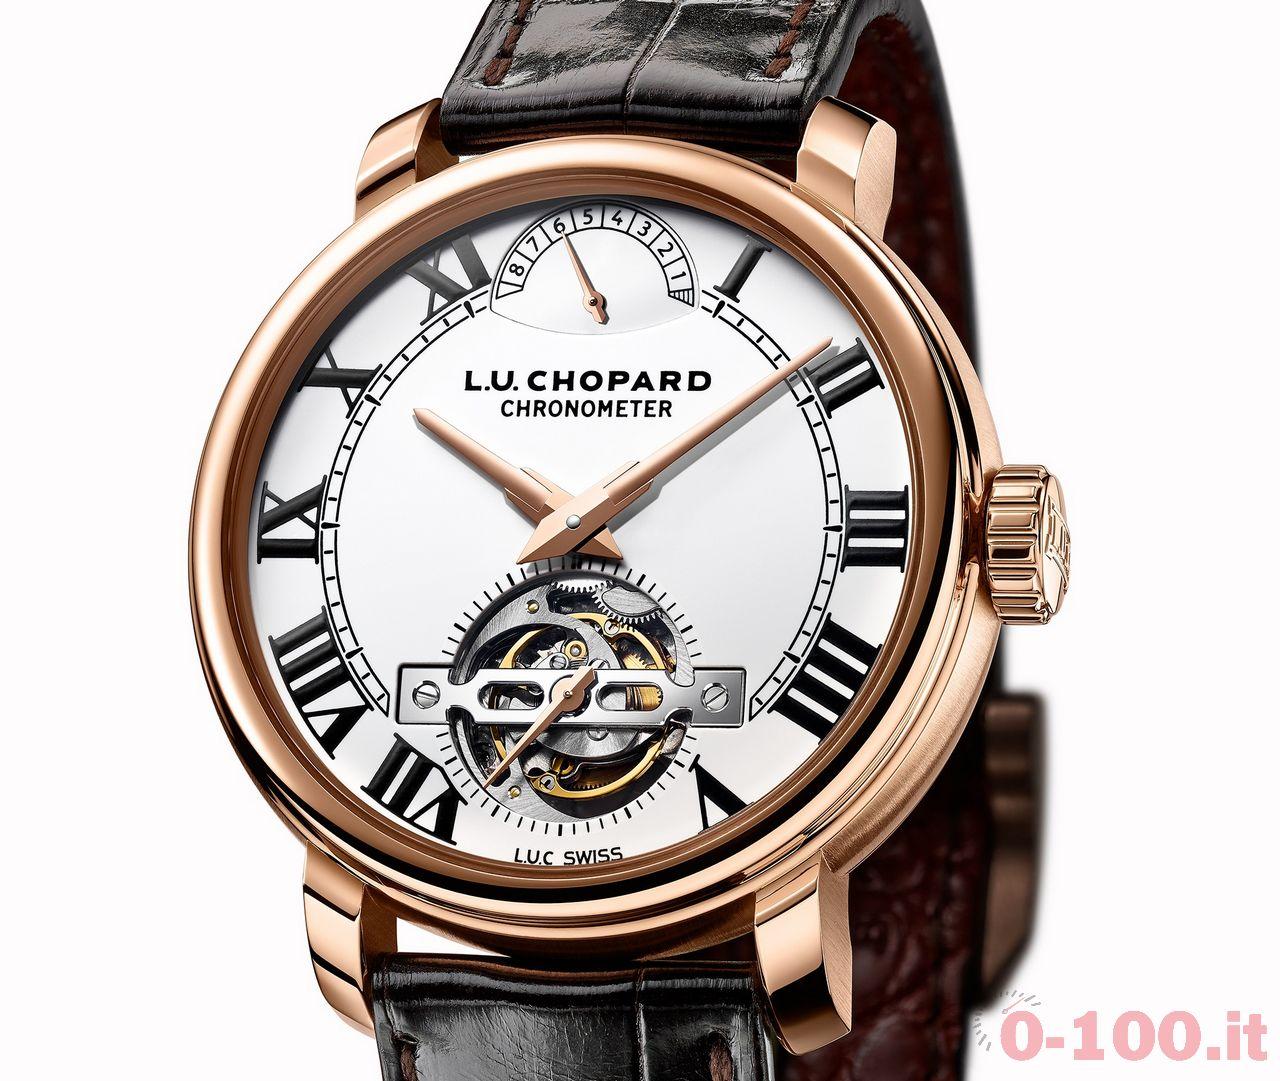 chopard-l-u-c-1963-tourbillon-ref-161970-5001-price_0-1002